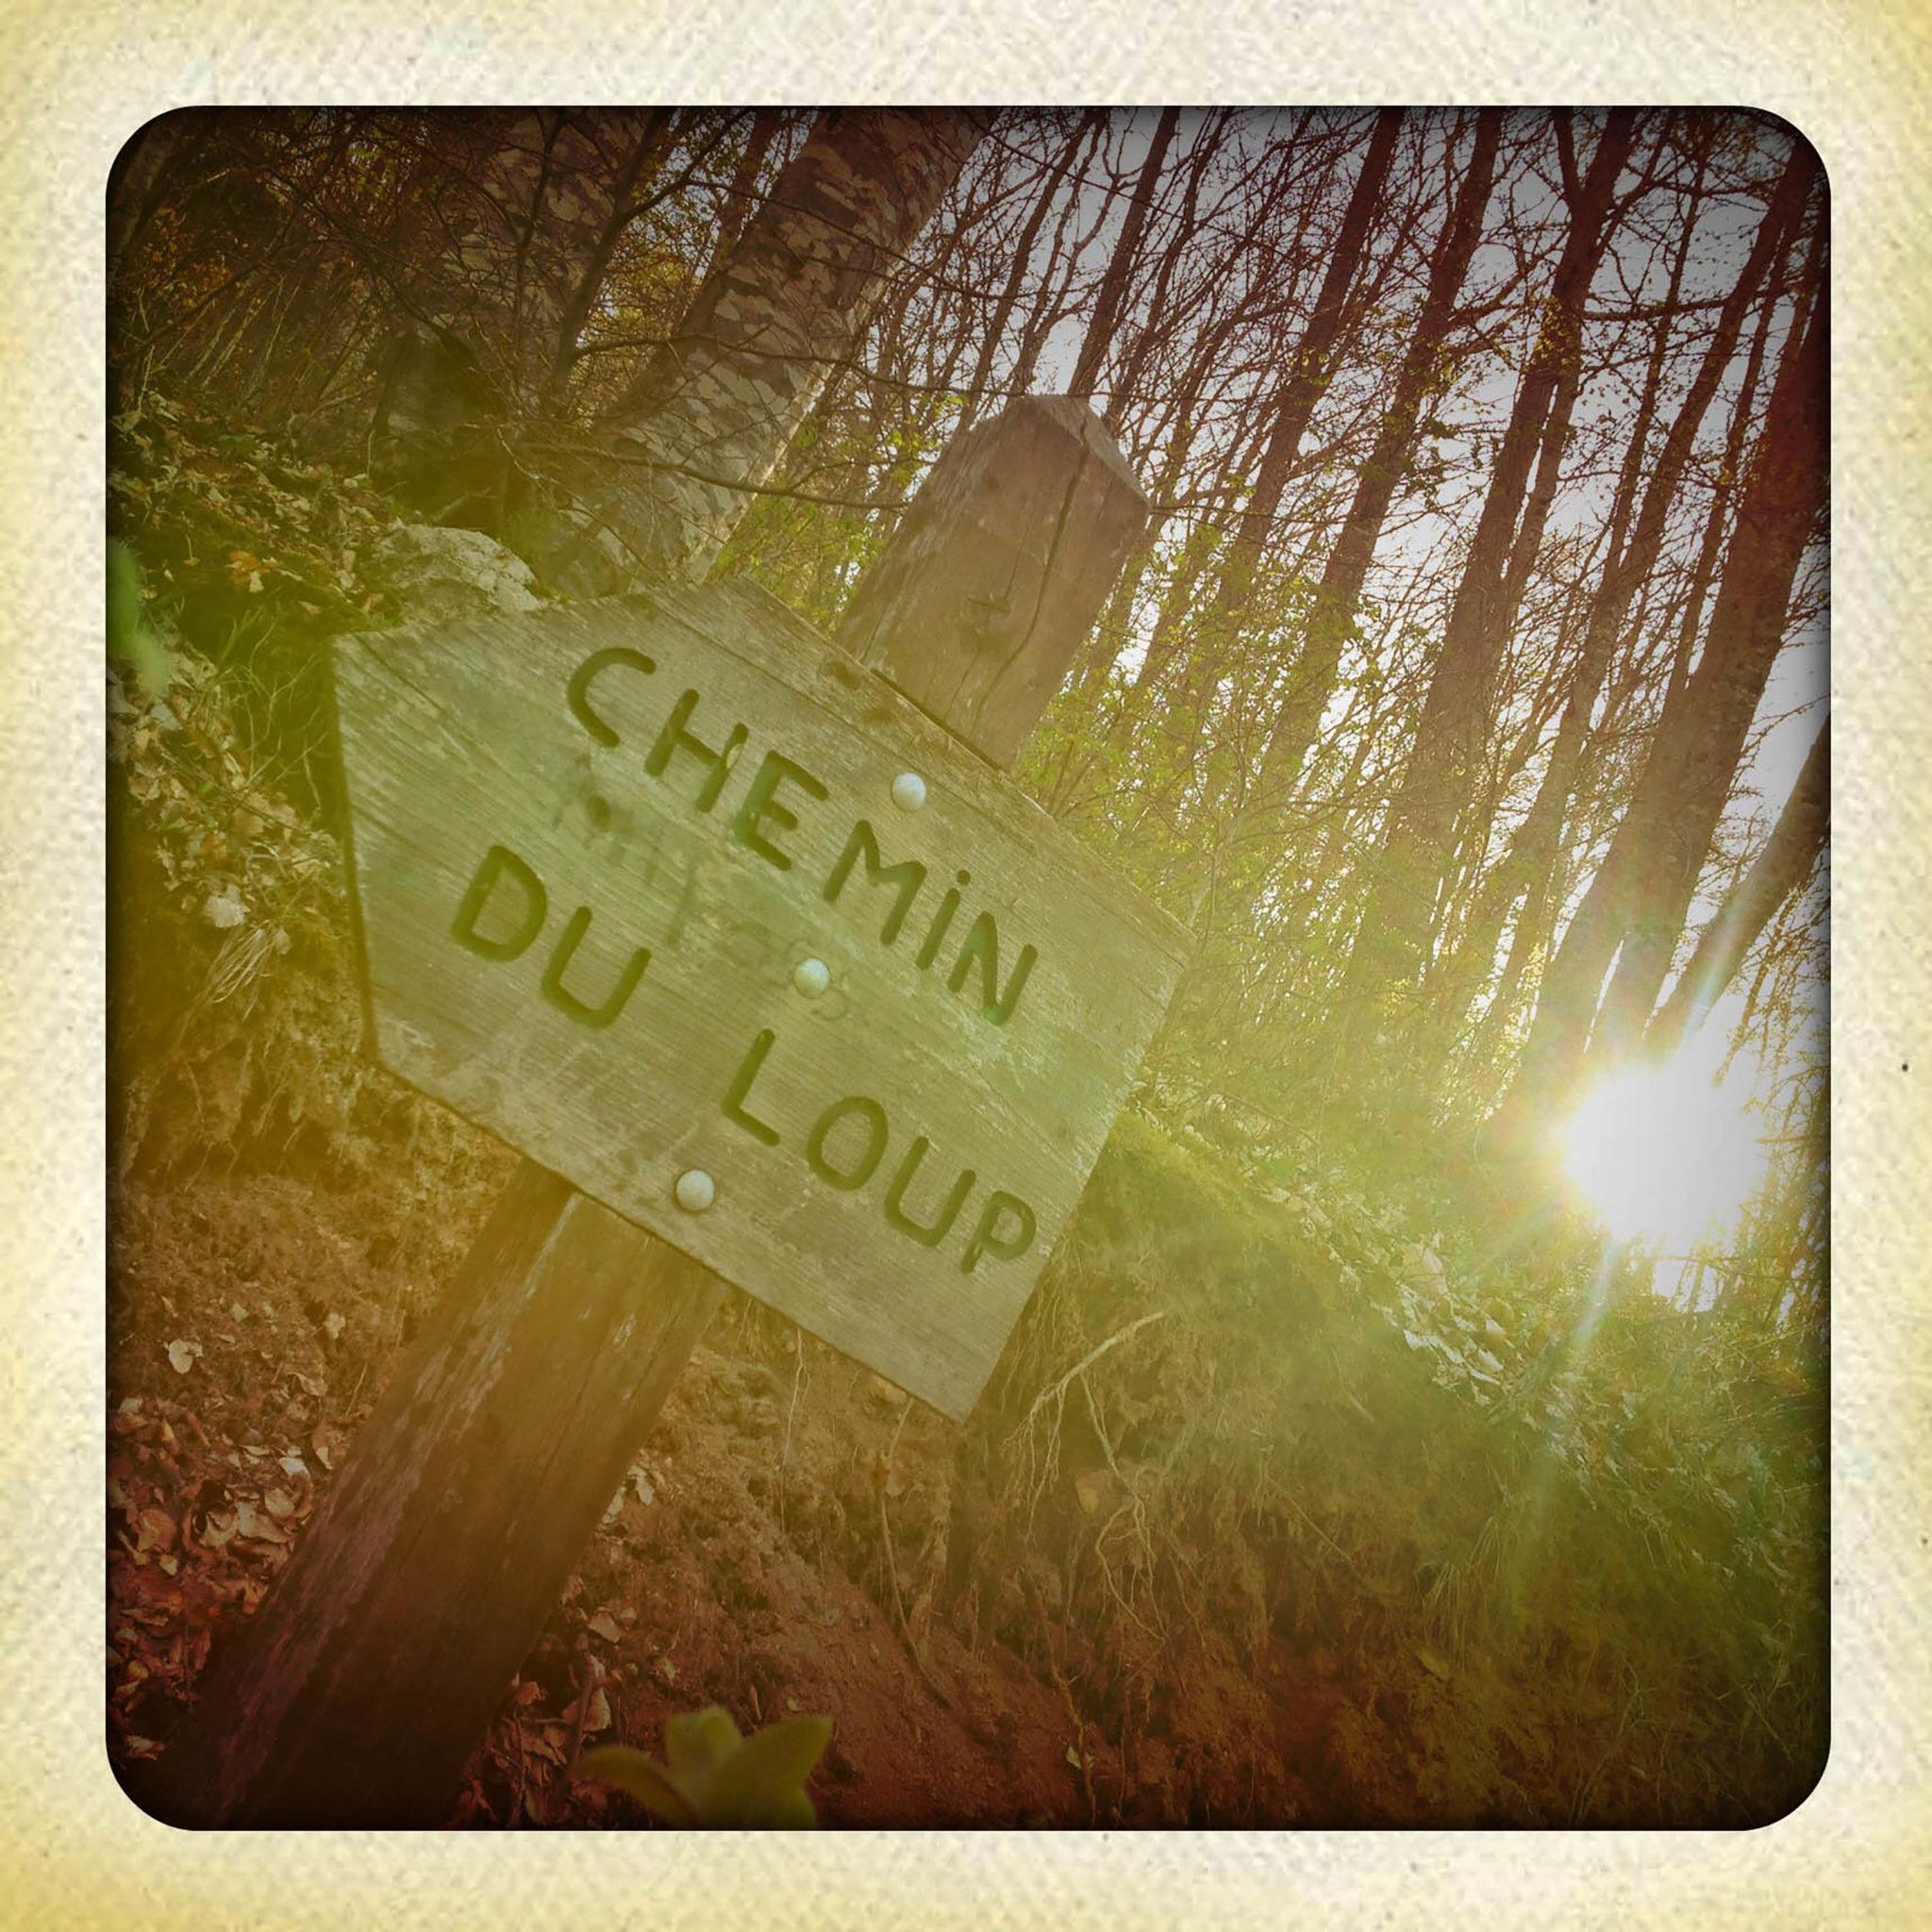 735_chemin-du-loup.jpg -